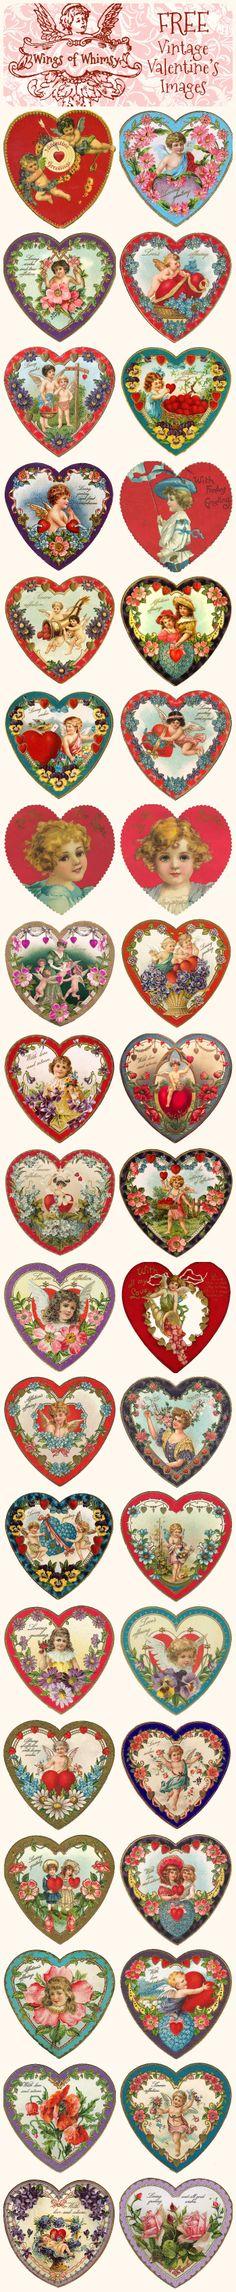 Vintage Valentine's Hearts – DAY 5